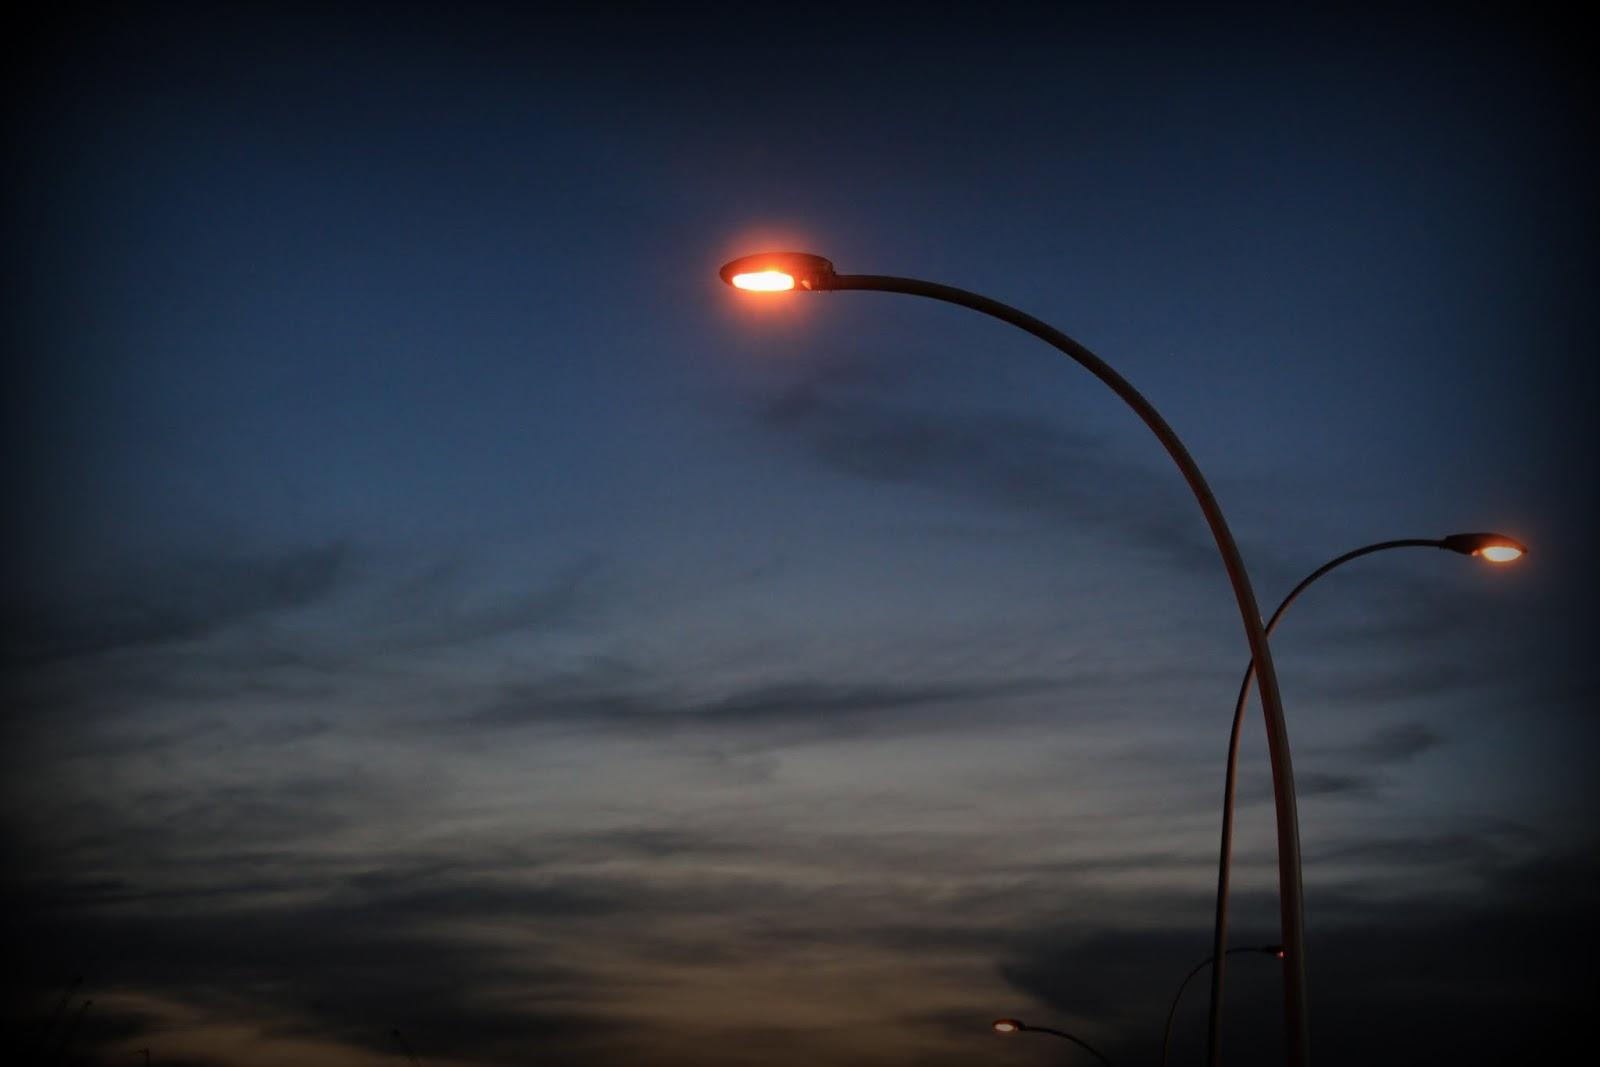 Just capture...: Lamp Post at night